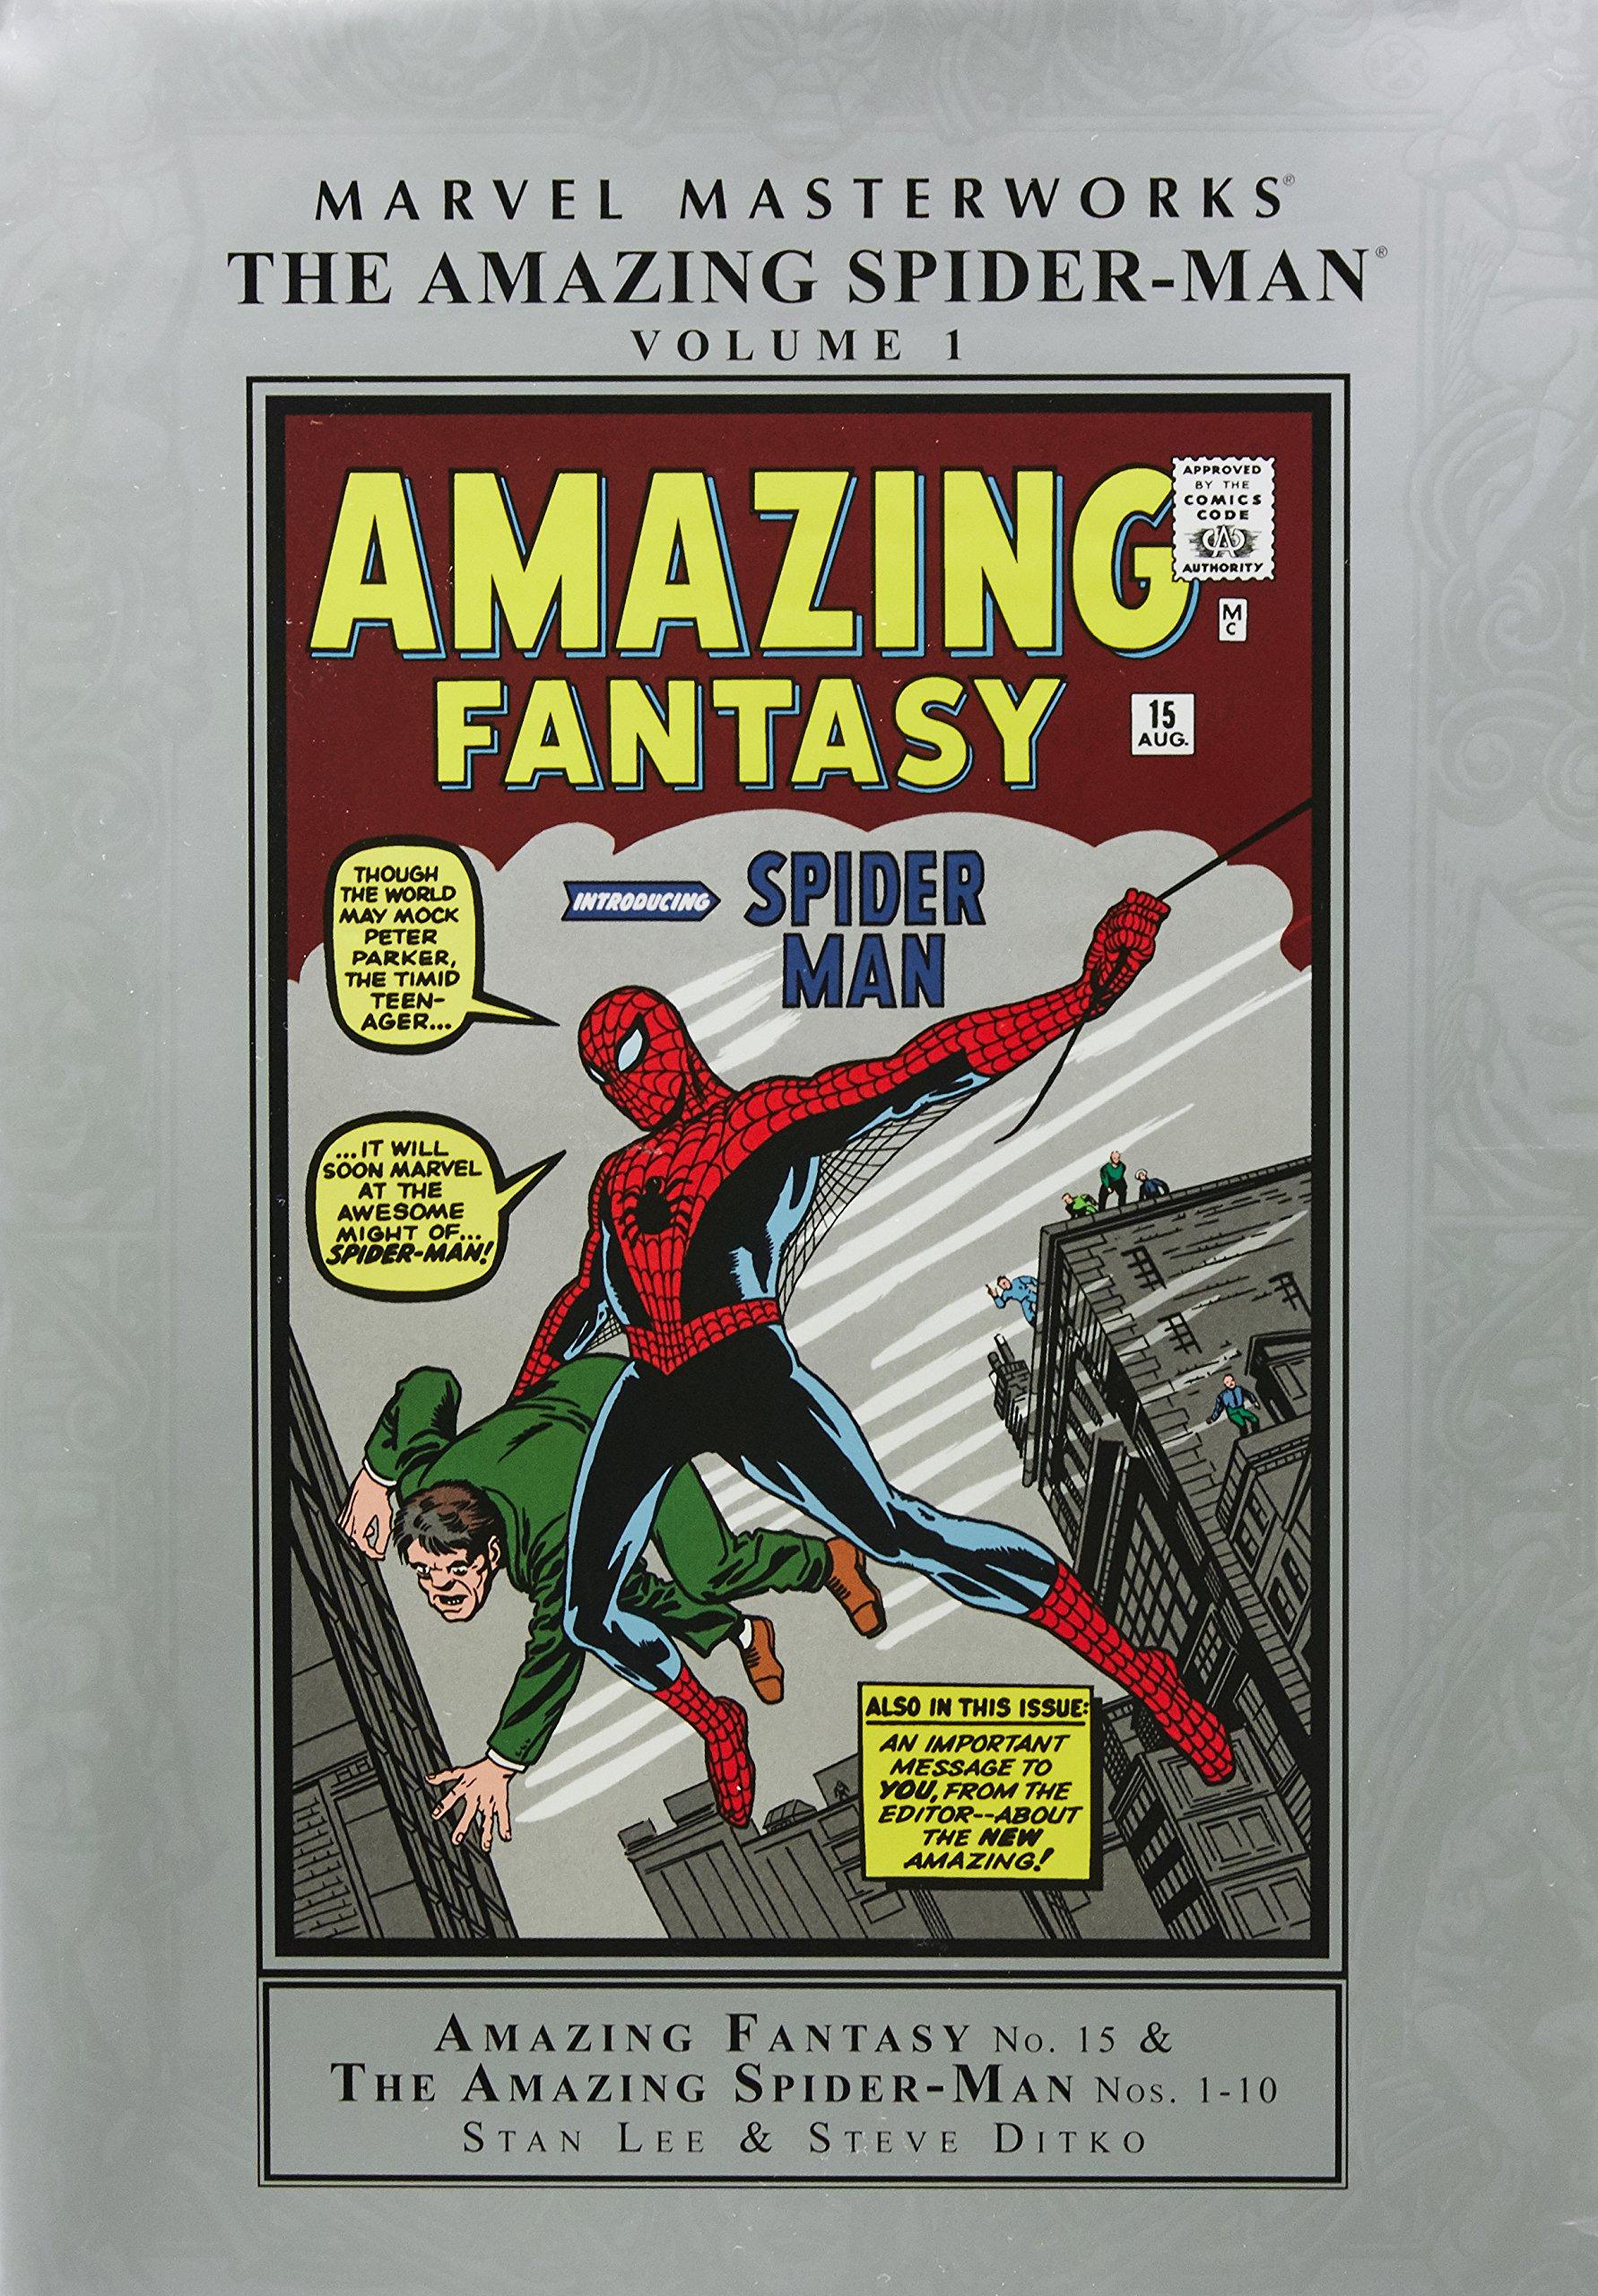 d4ed2988 Marvel Masterworks: The Amazing Spider-Man Volume 1 (New Printing ...